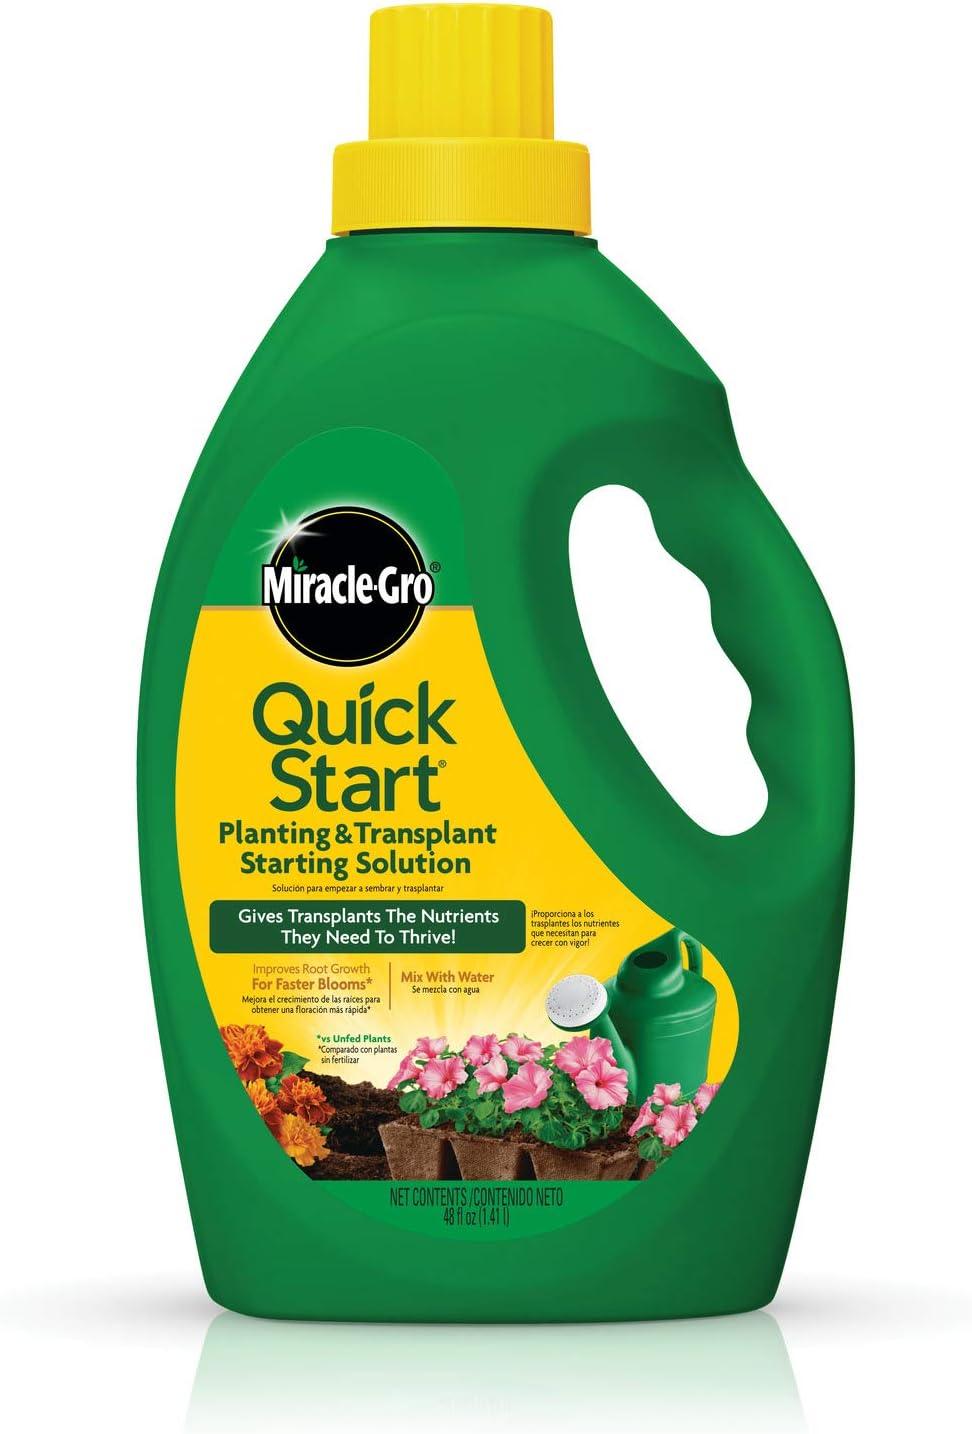 Miracle-Gro Quick Start Planting & Transplant Starting Solution (Liquid), 48 oz.